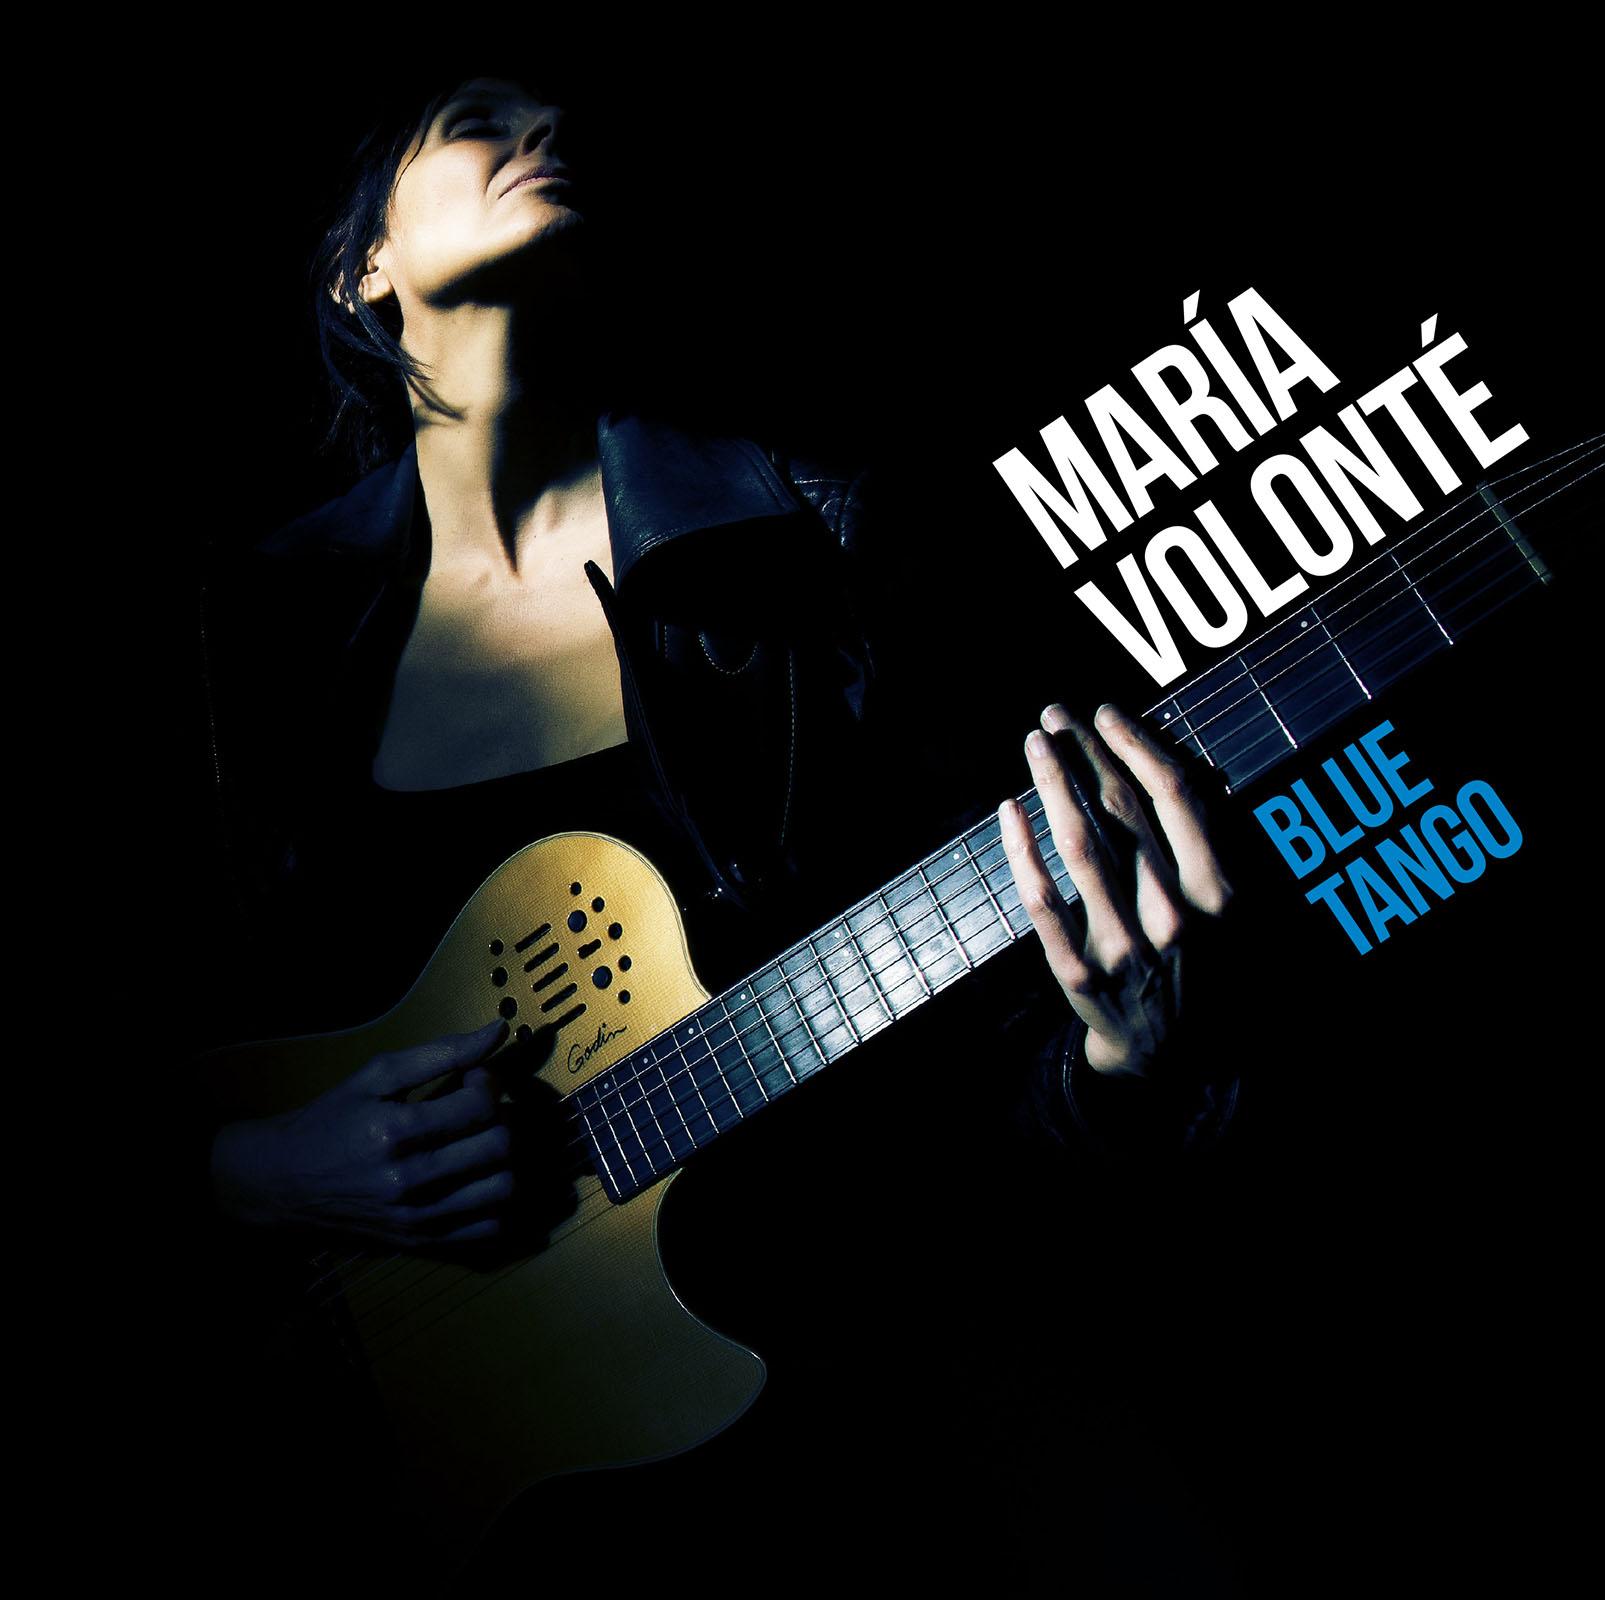 Volonte-Blue-Tango-CD-1600px